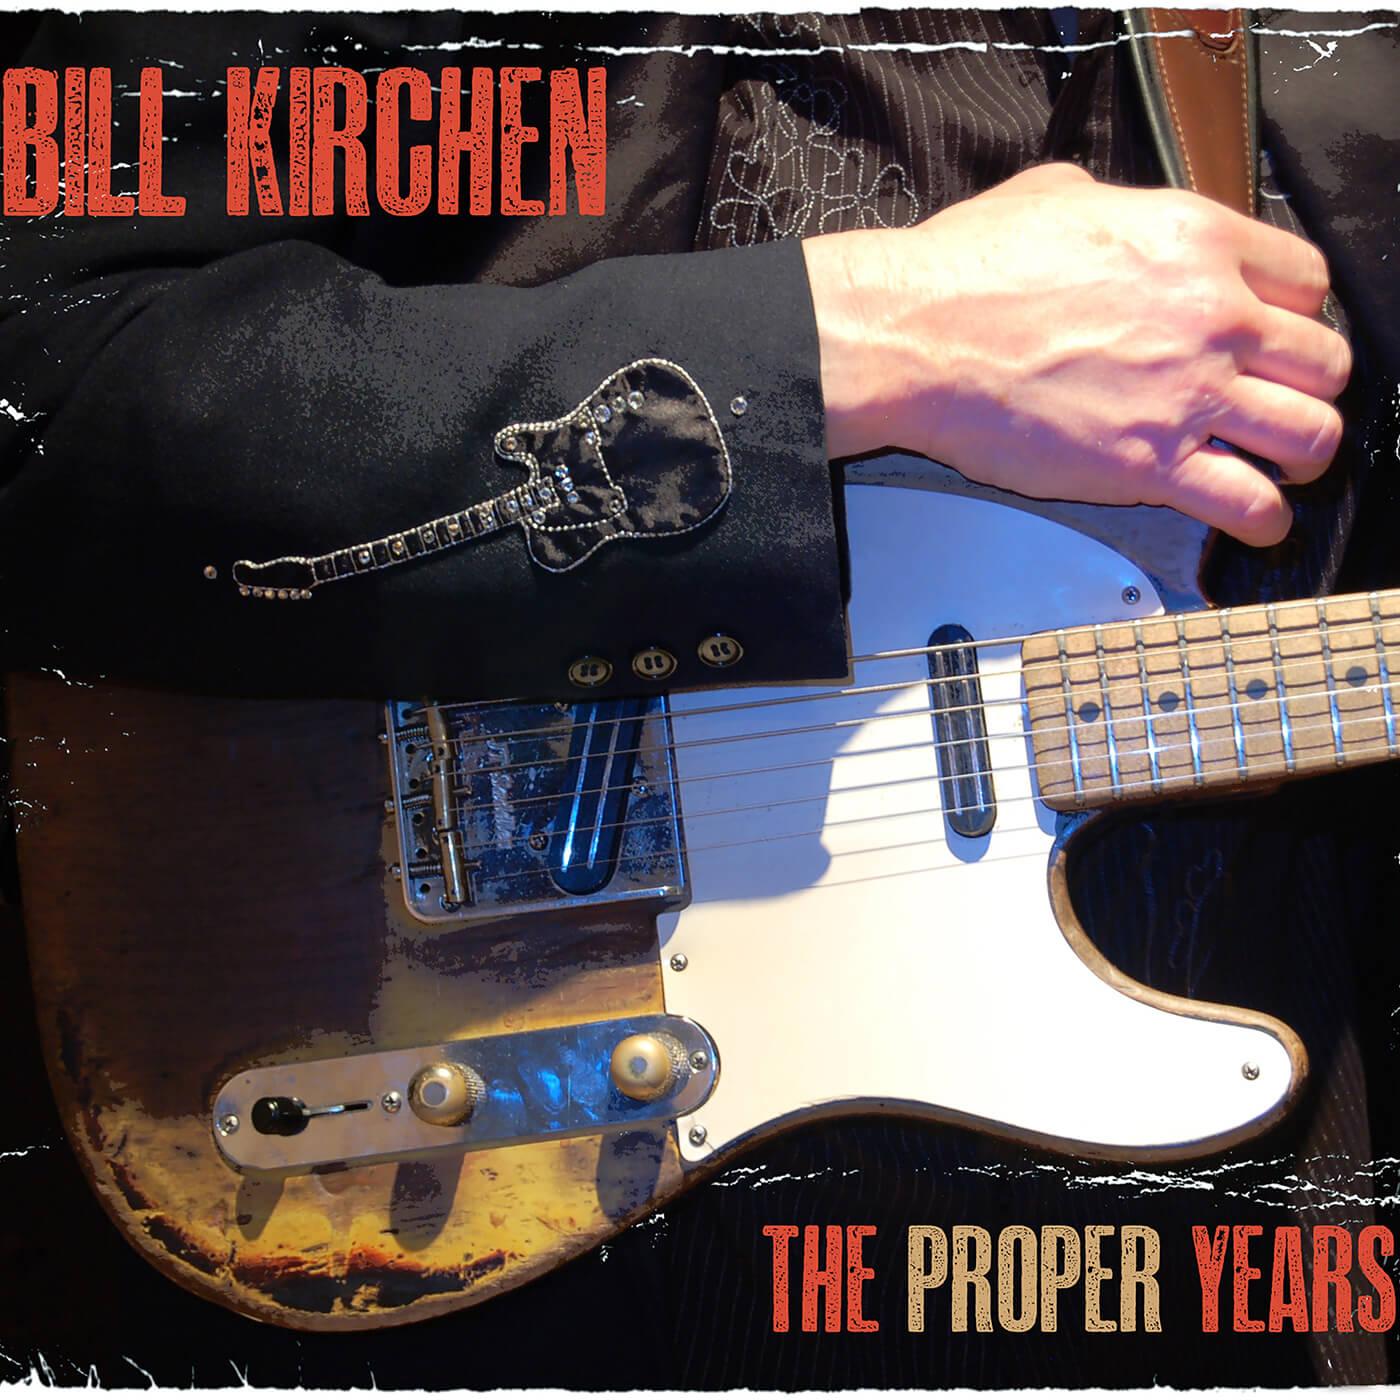 Bill Kirchen - Proper Years